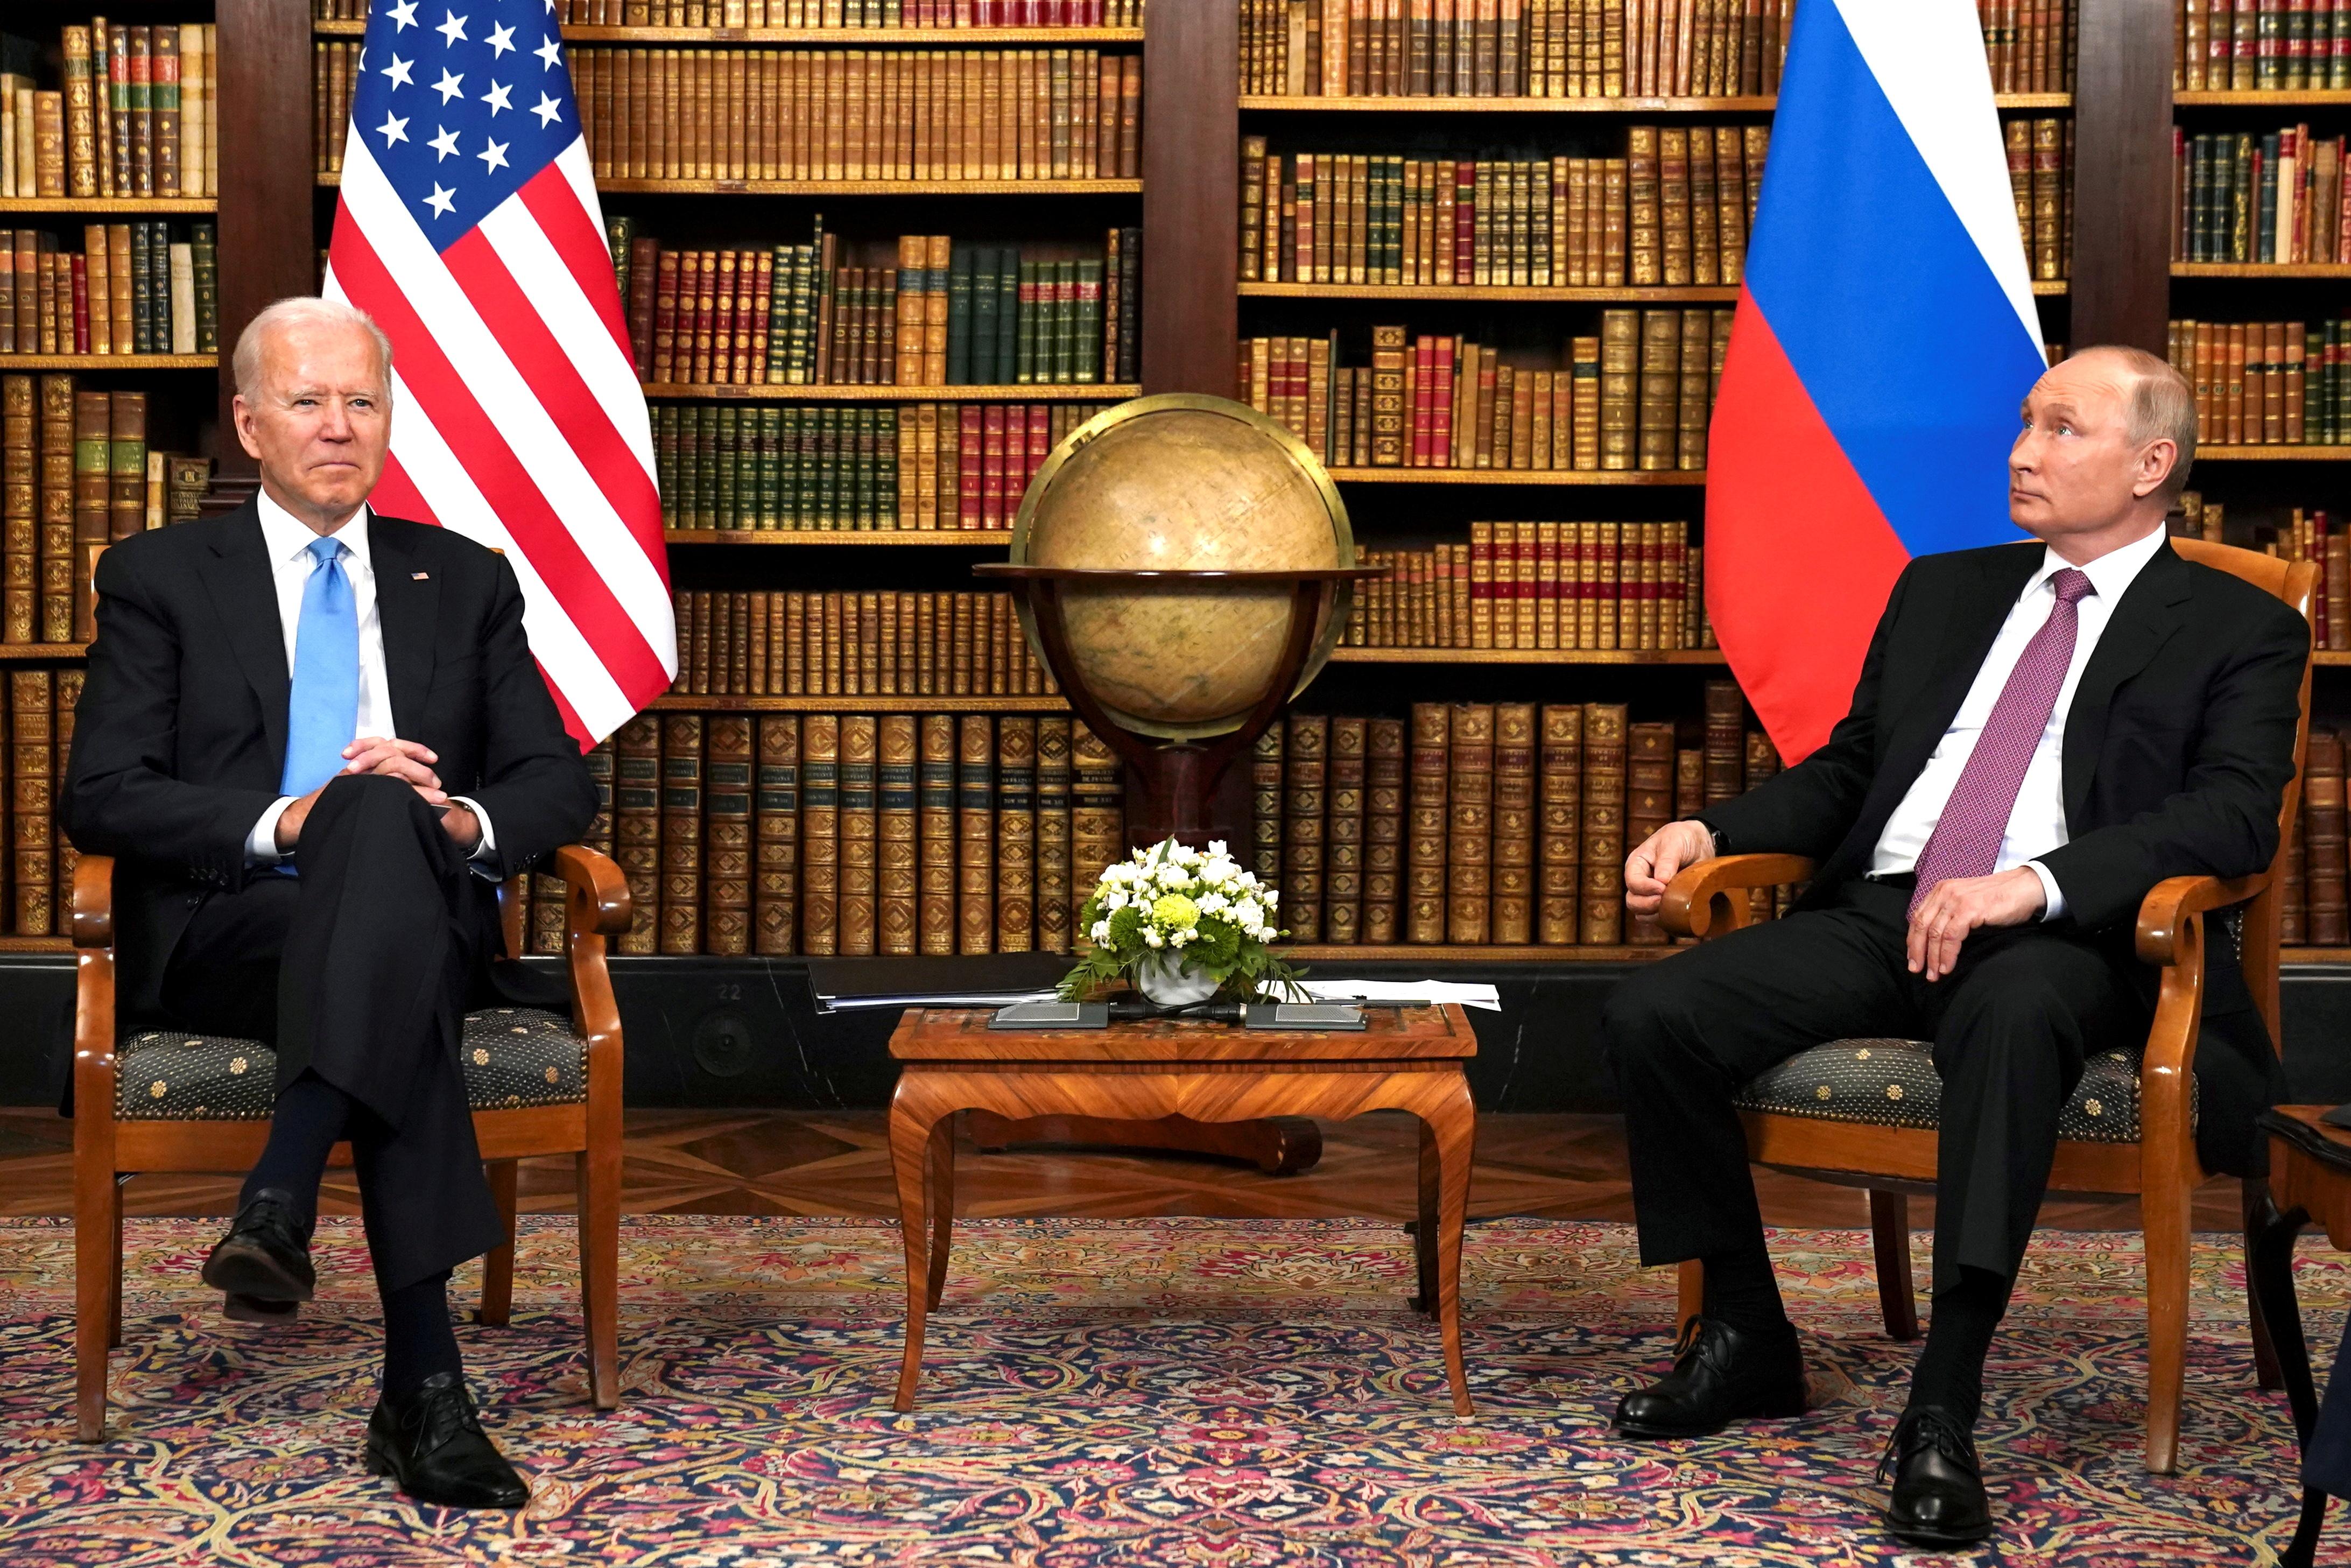 U.S. President Joe Biden and Russia's President Vladimir Putin meet for a summit at Villa La Grange in Geneva, Switzerland, June 16, 2021. REUTERS/Kevin Lamarque/Files